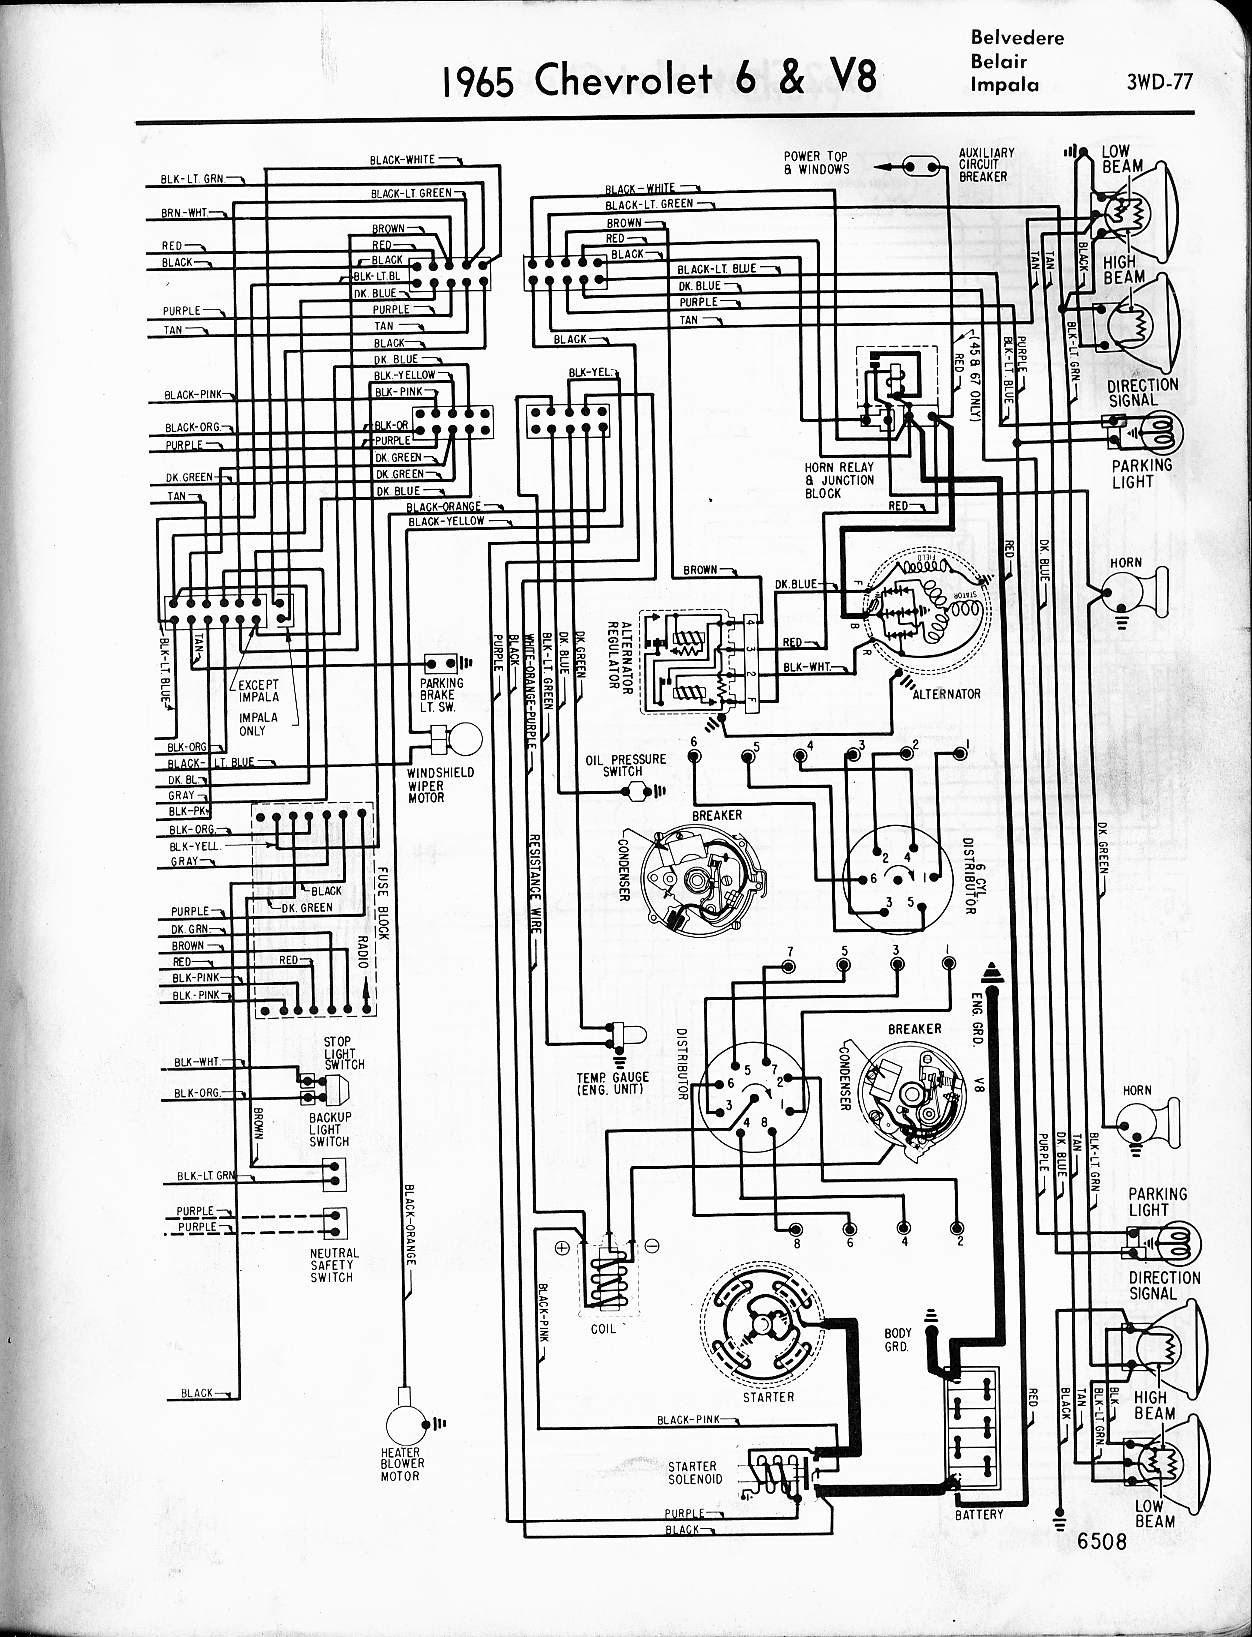 2000 Chevy Cavalier Engine Diagram